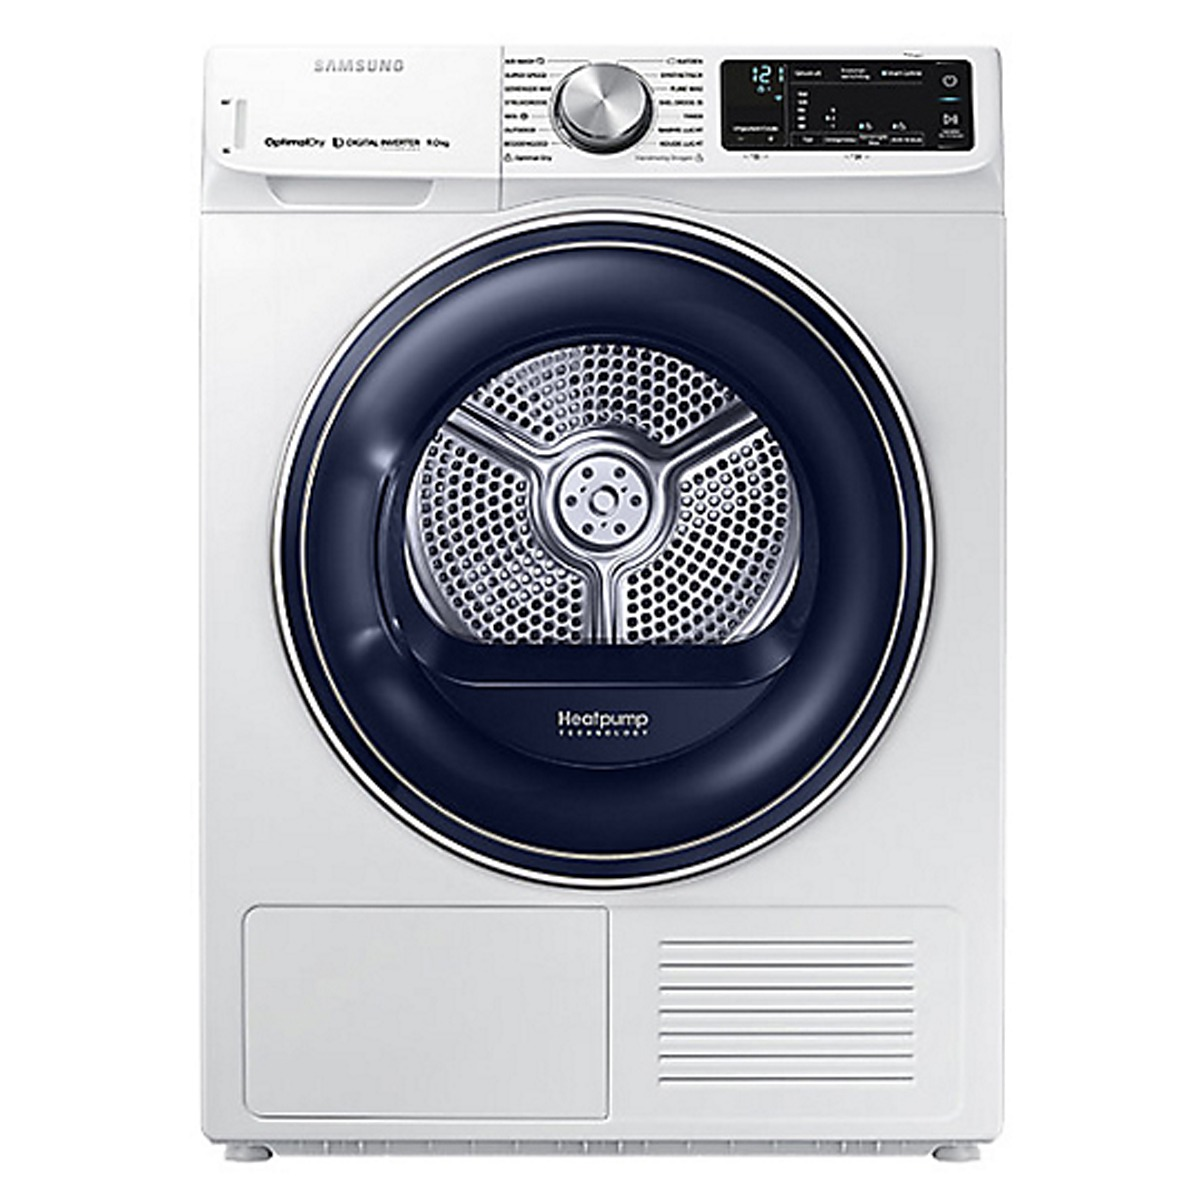 Samsung DV90N62632W warmtepompdroger